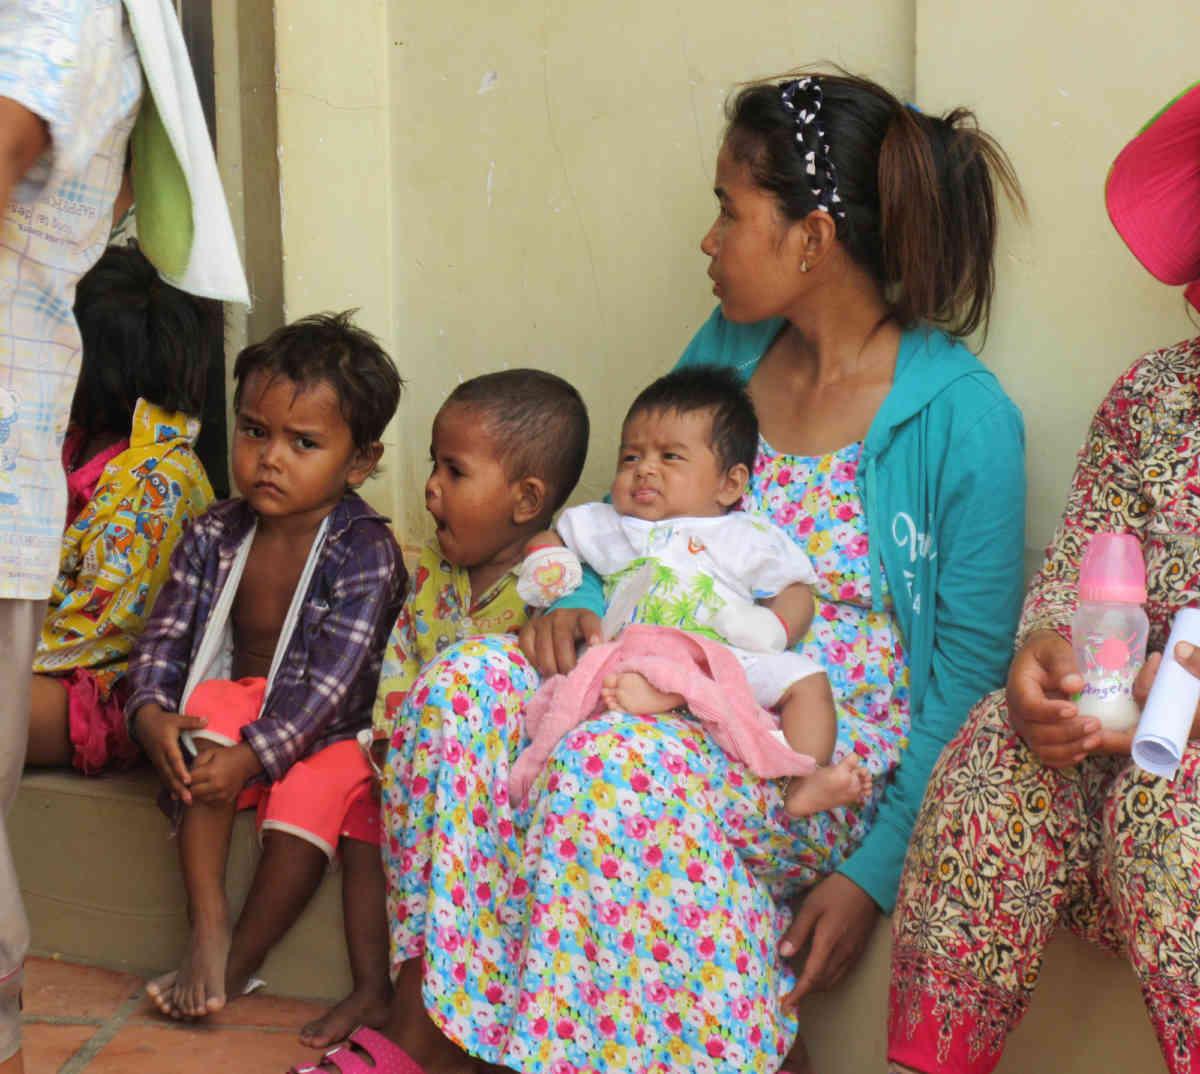 Sen Sok Family Waiting 7 5 2015